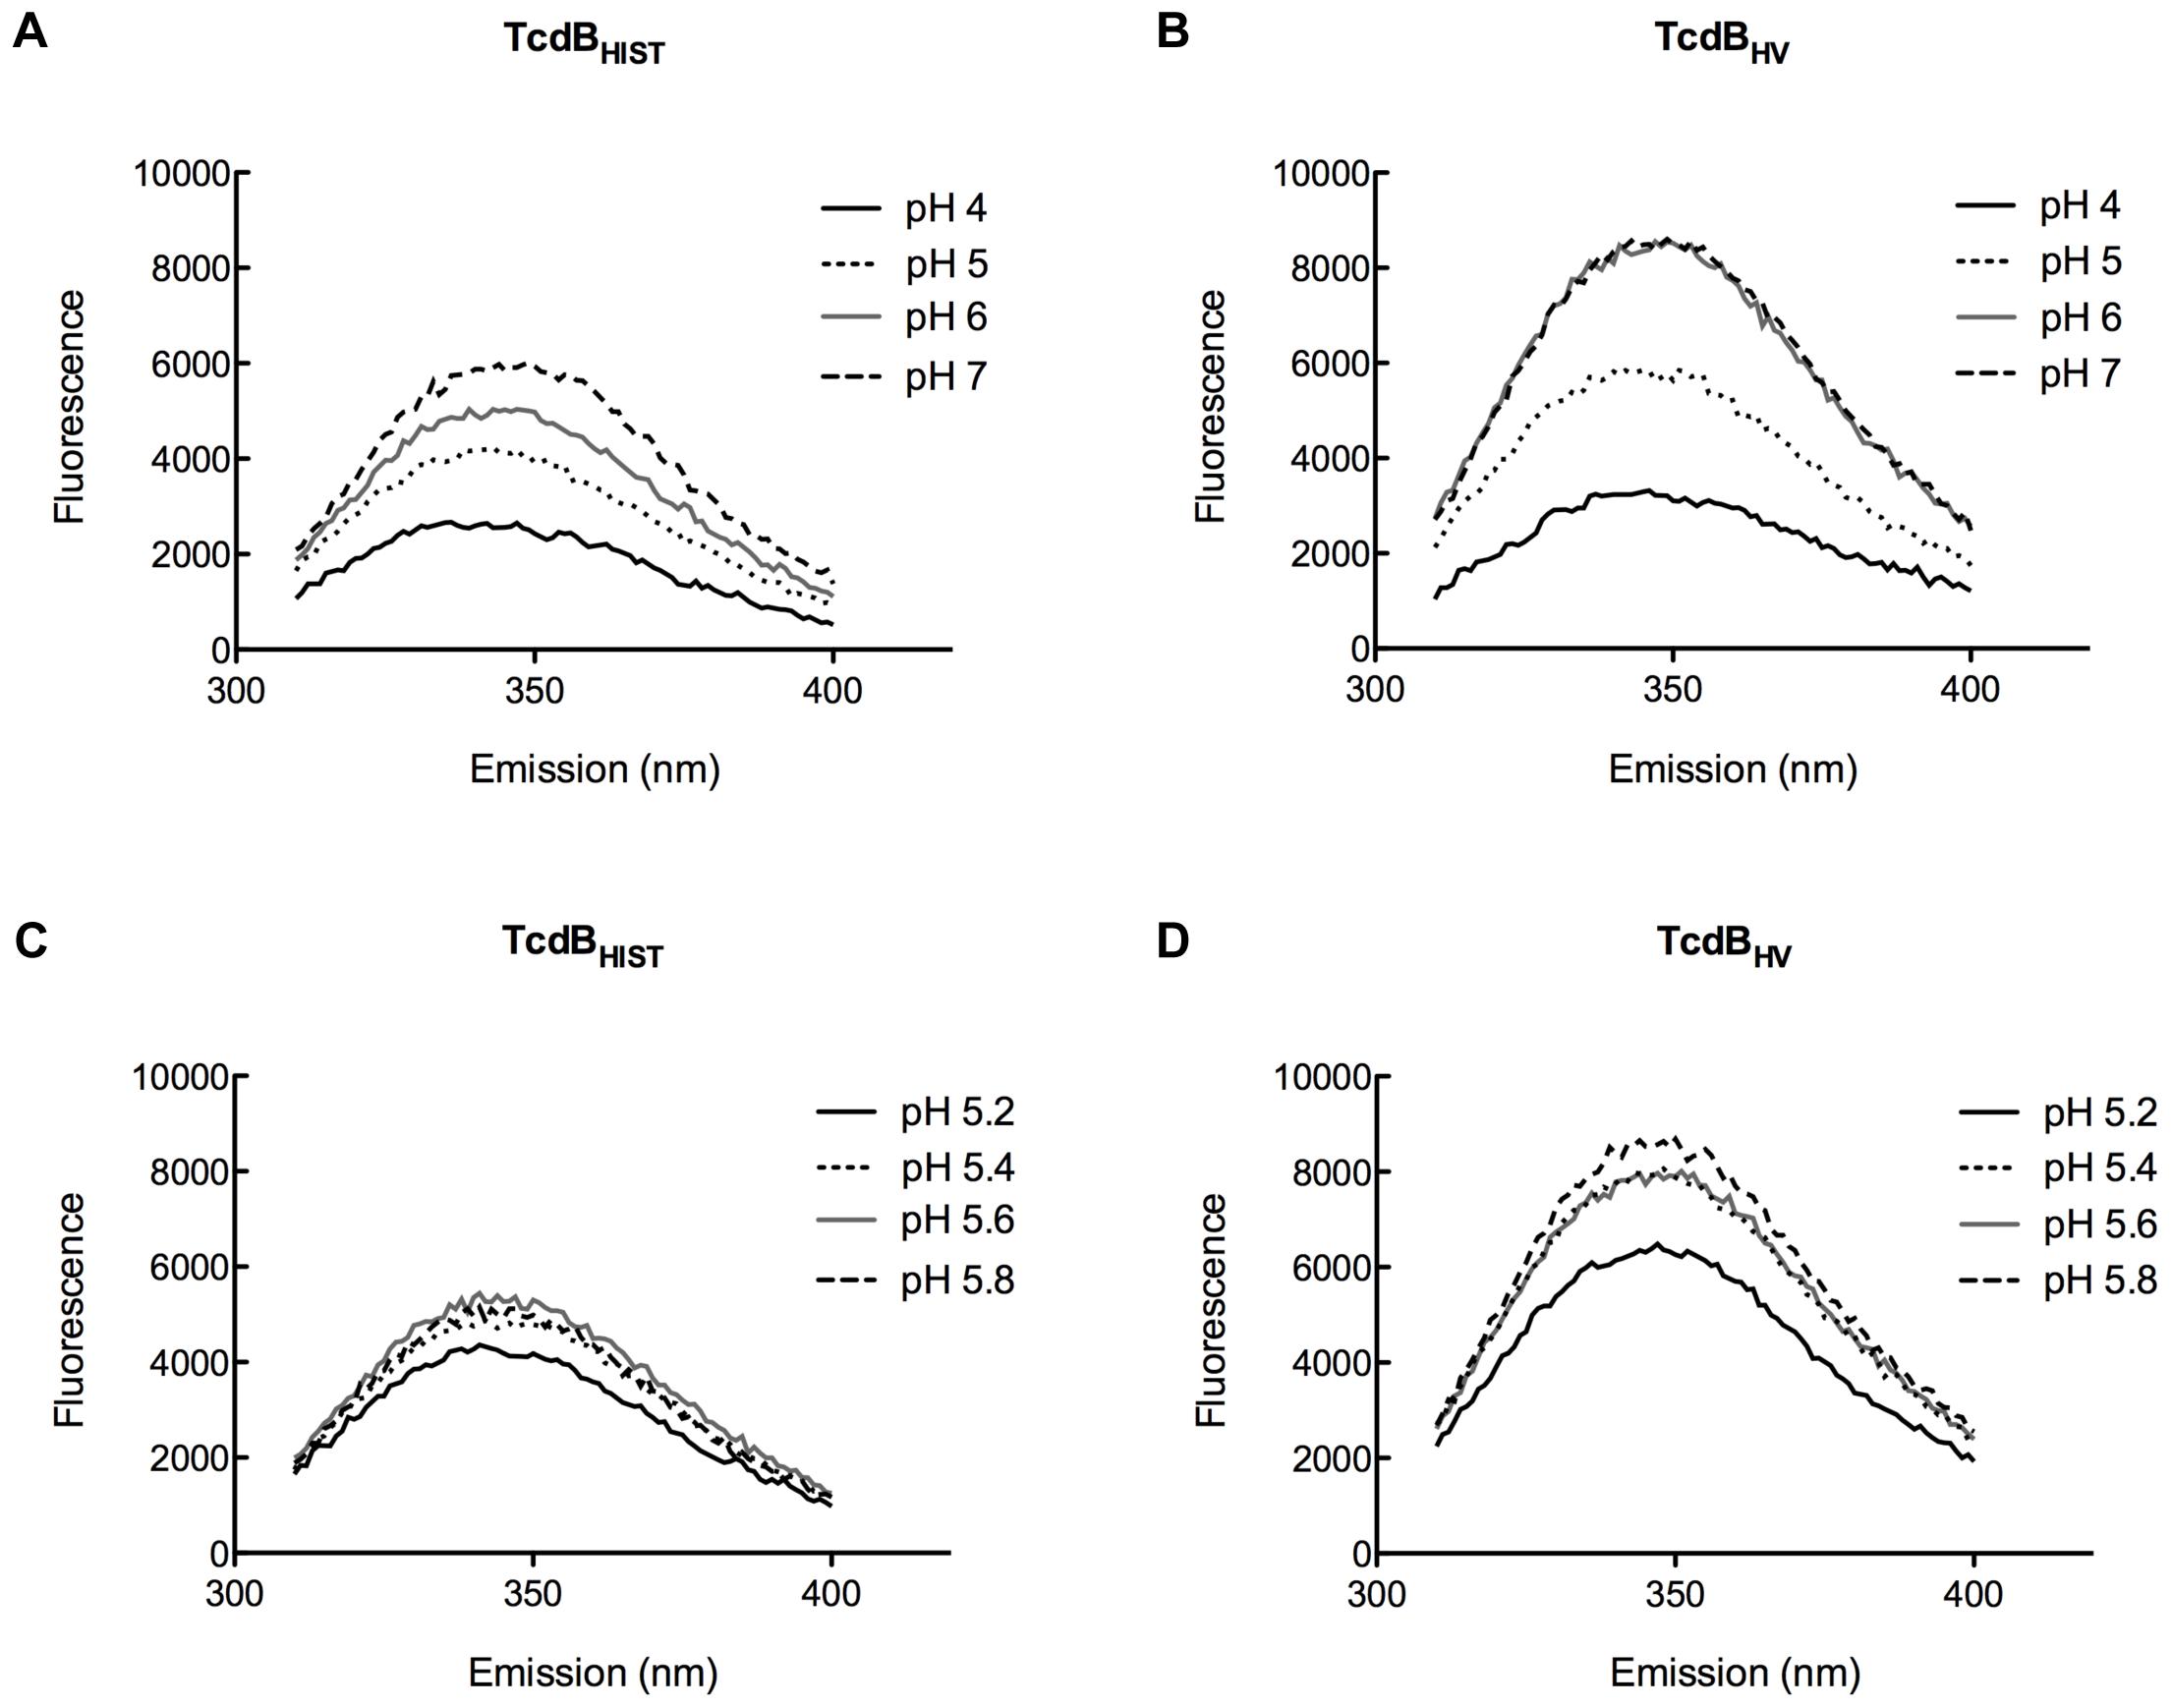 Tryptophan emission of TcdB<sub>HIST</sub> and TcdB<sub>HV</sub> at acidic and neutral pH.